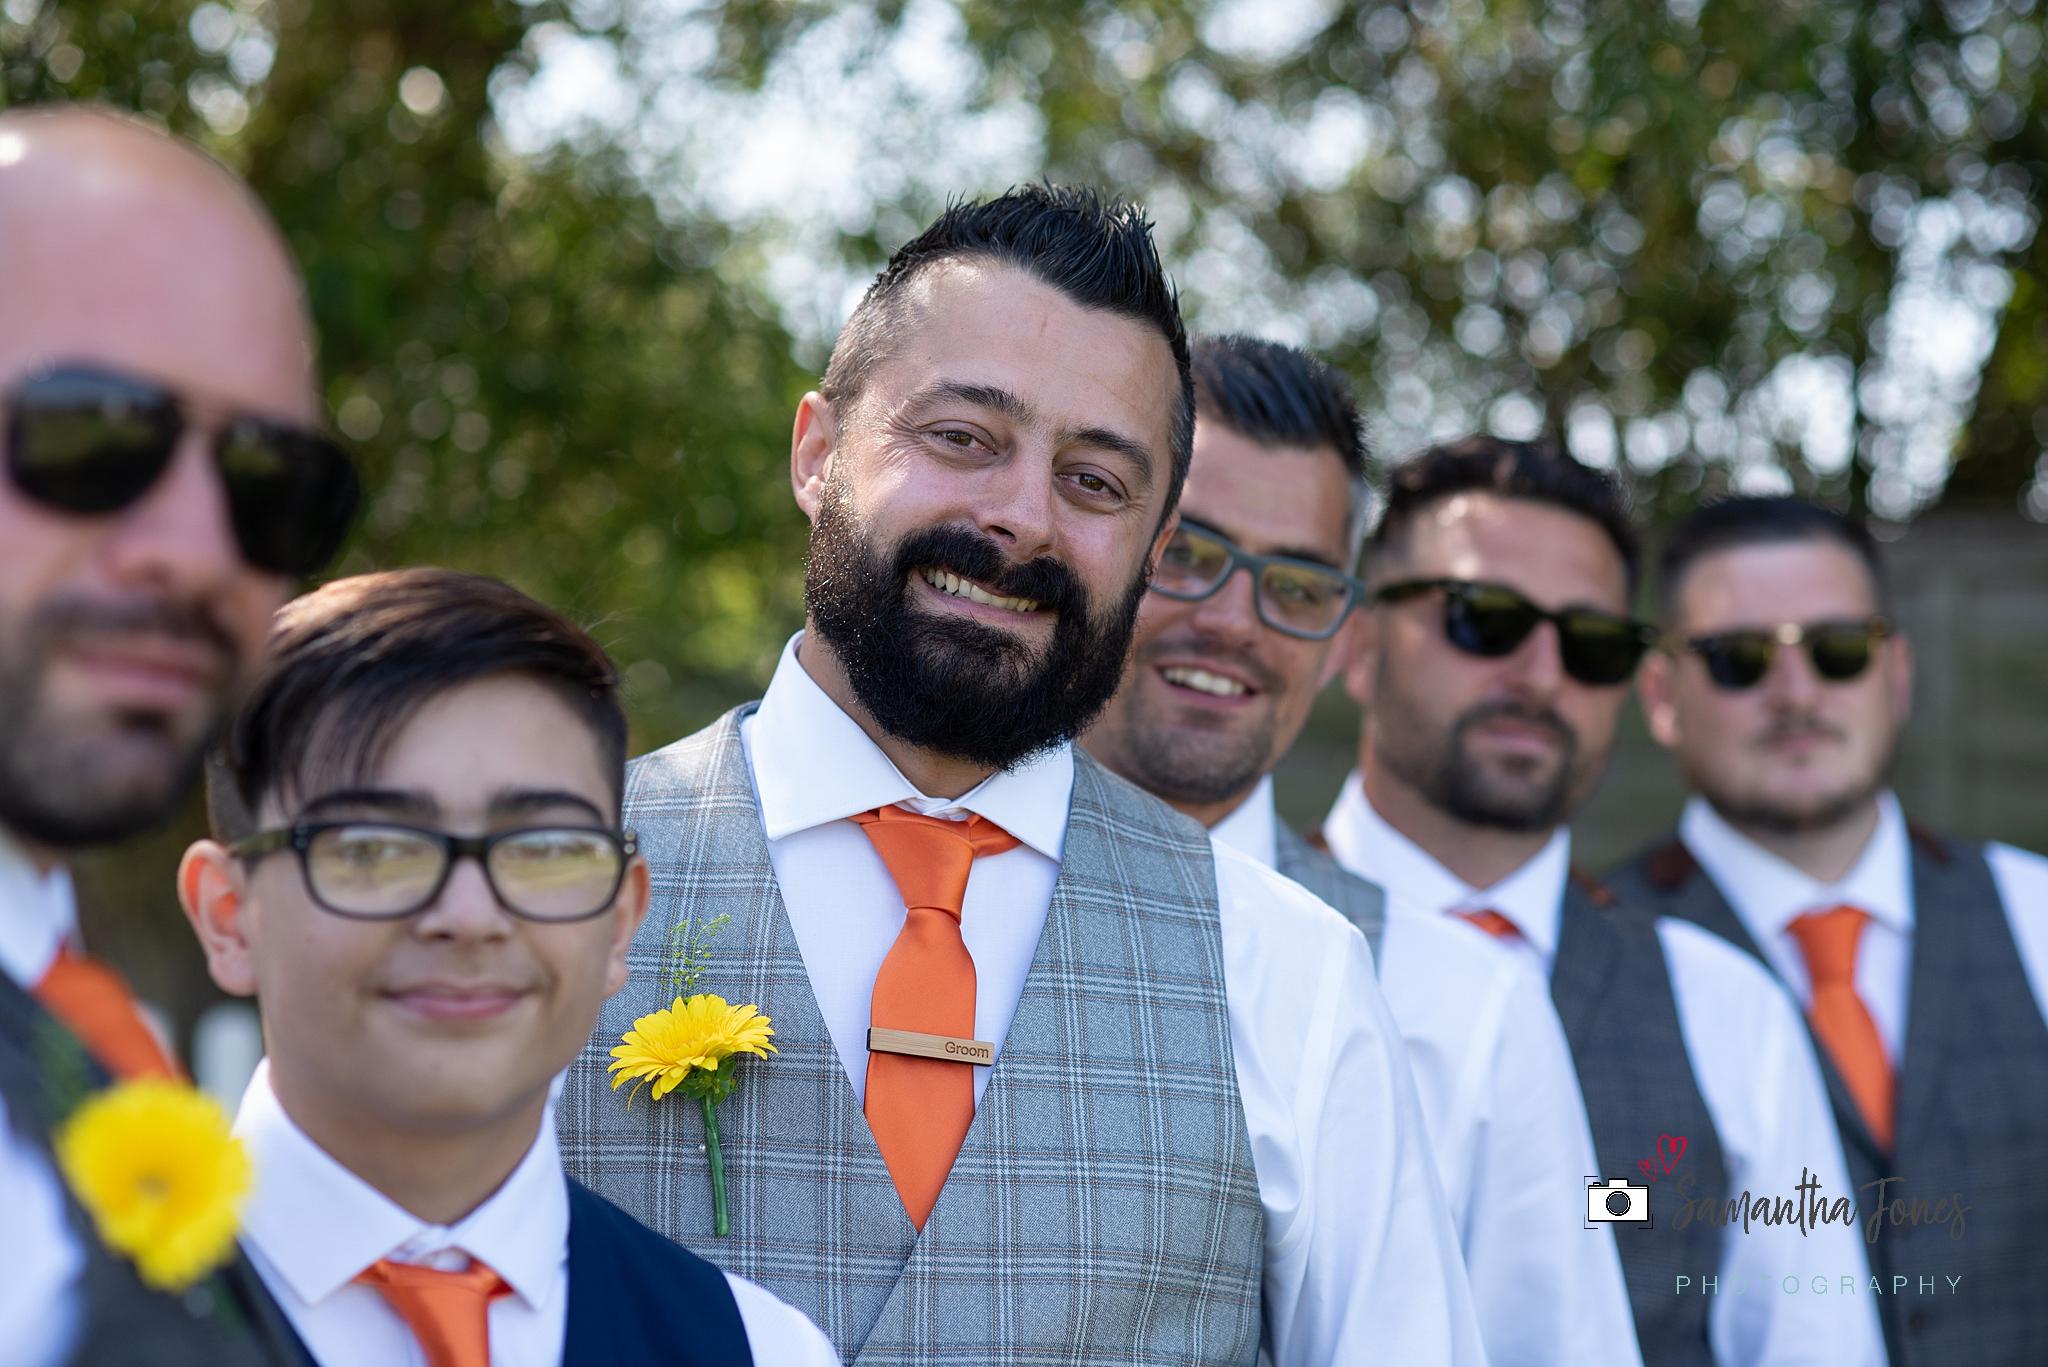 laughing groomsmen Kent wedding at Stonelees by Samantha Jones Photography